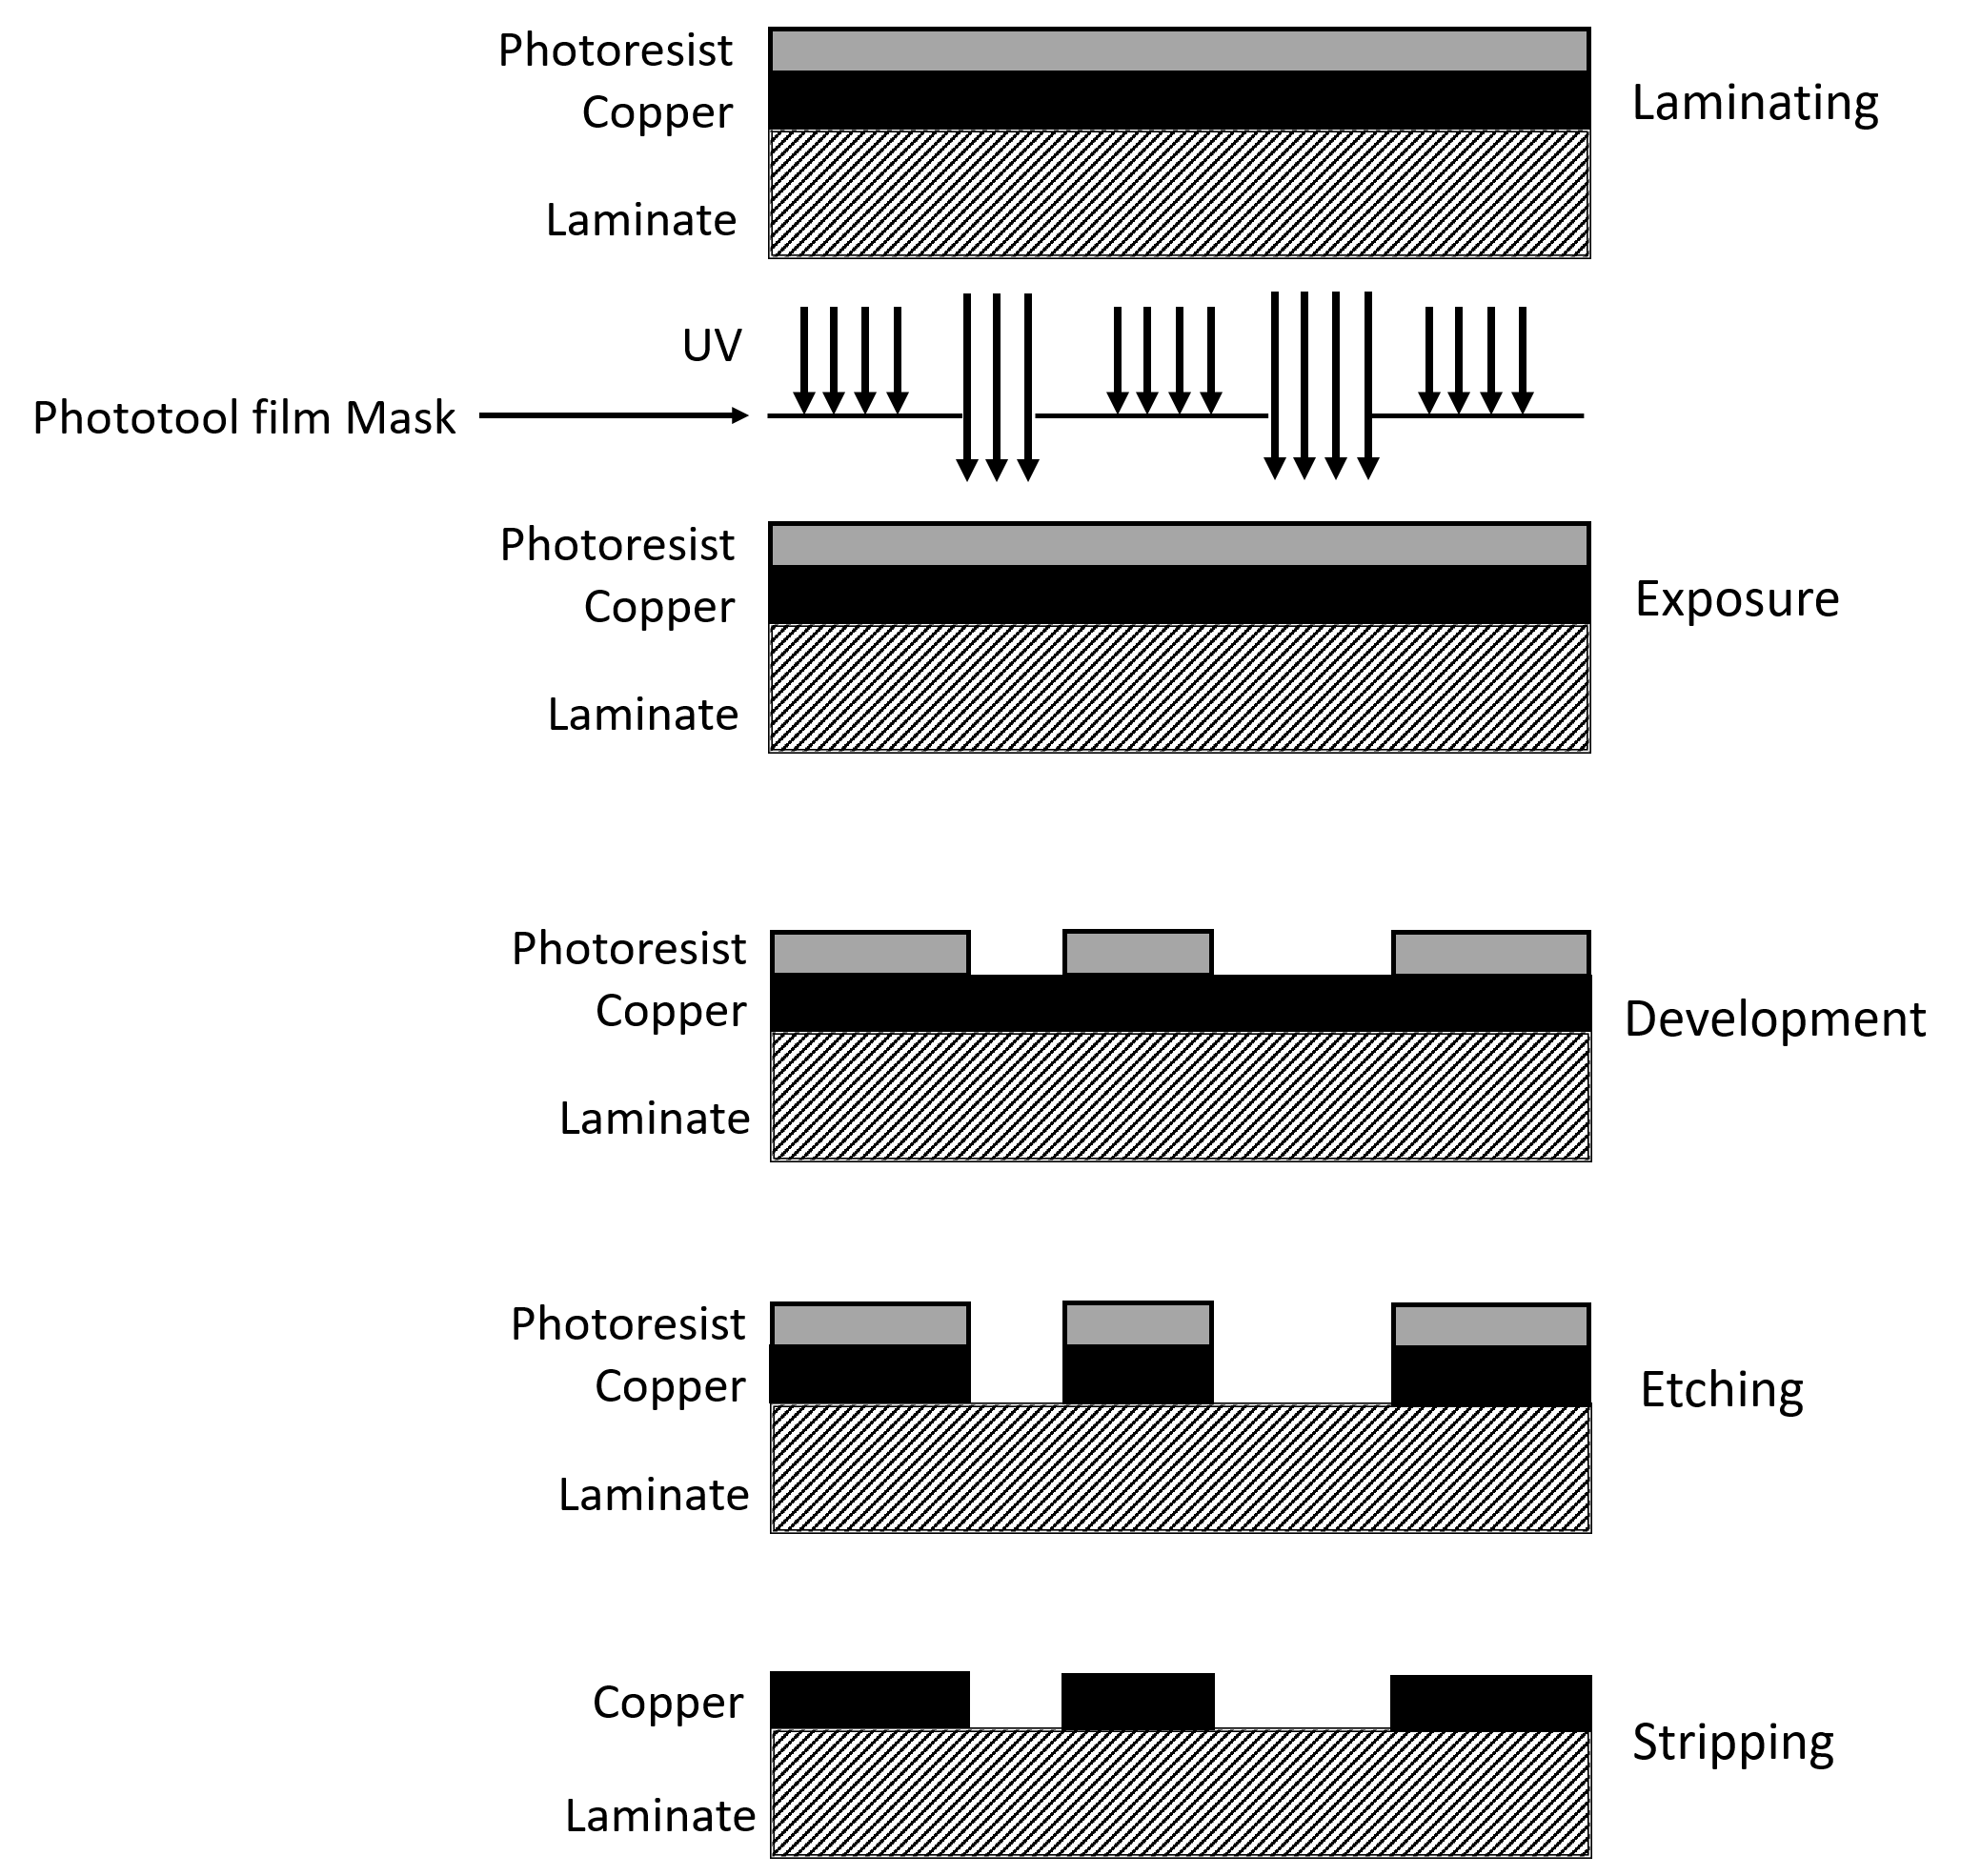 PCB Photolithography process